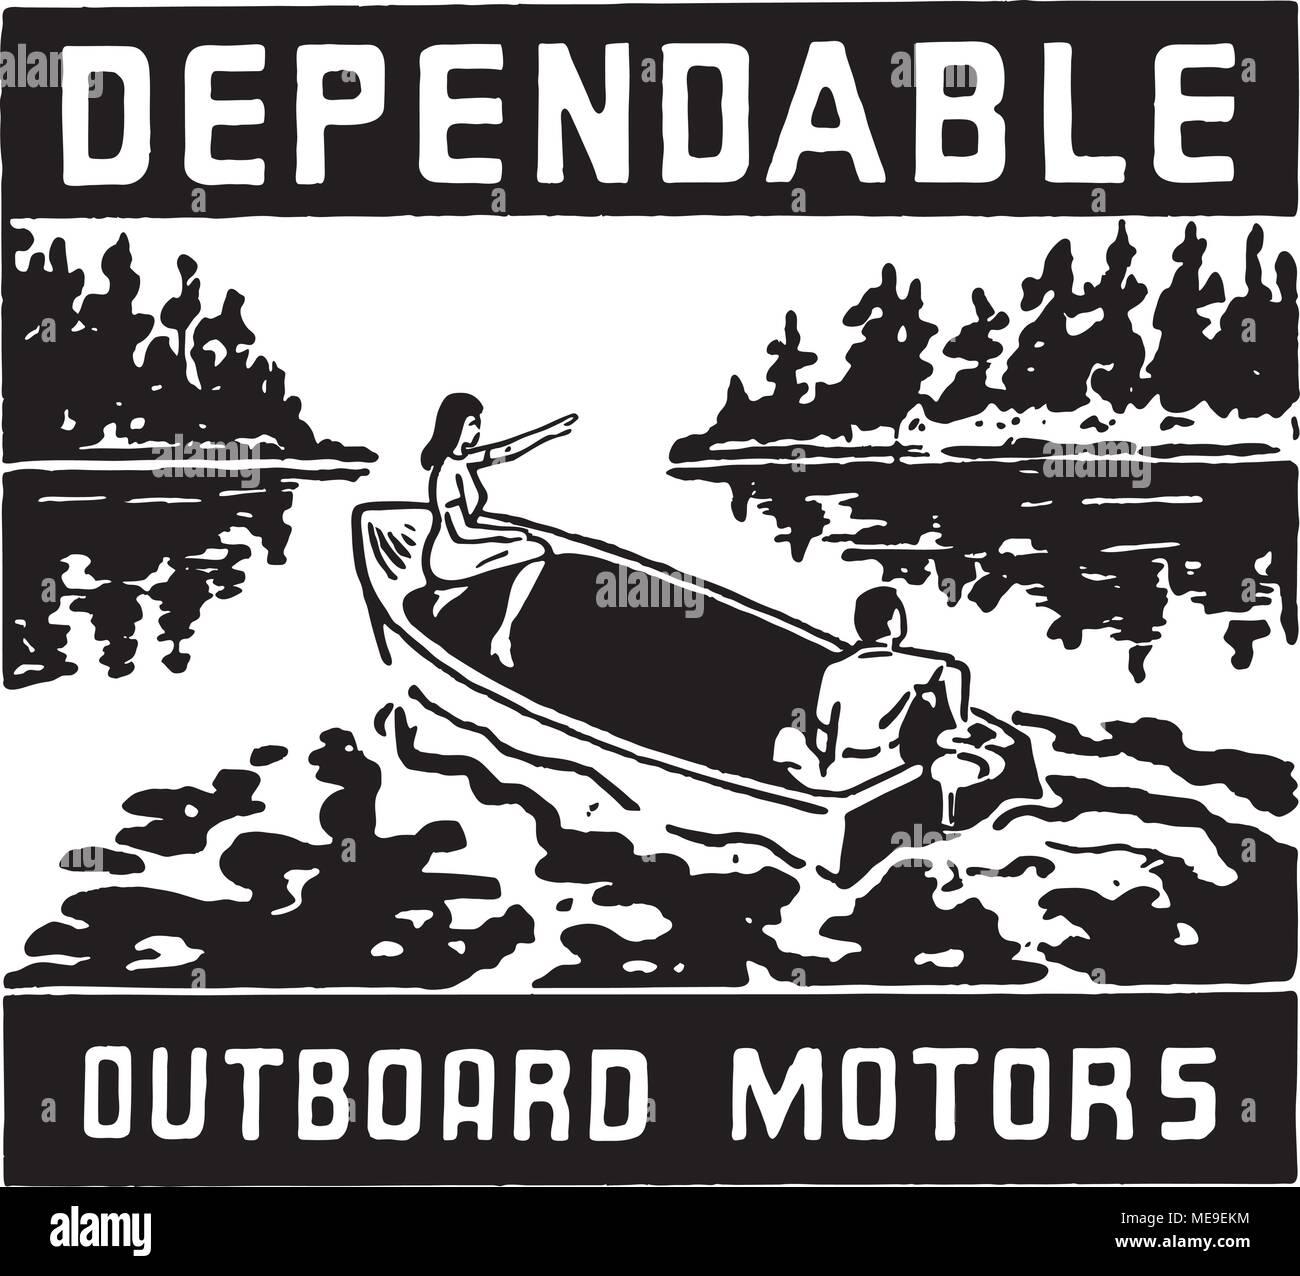 Dependable Outboard Motors - Retro Ad Art Banner - Stock Vector